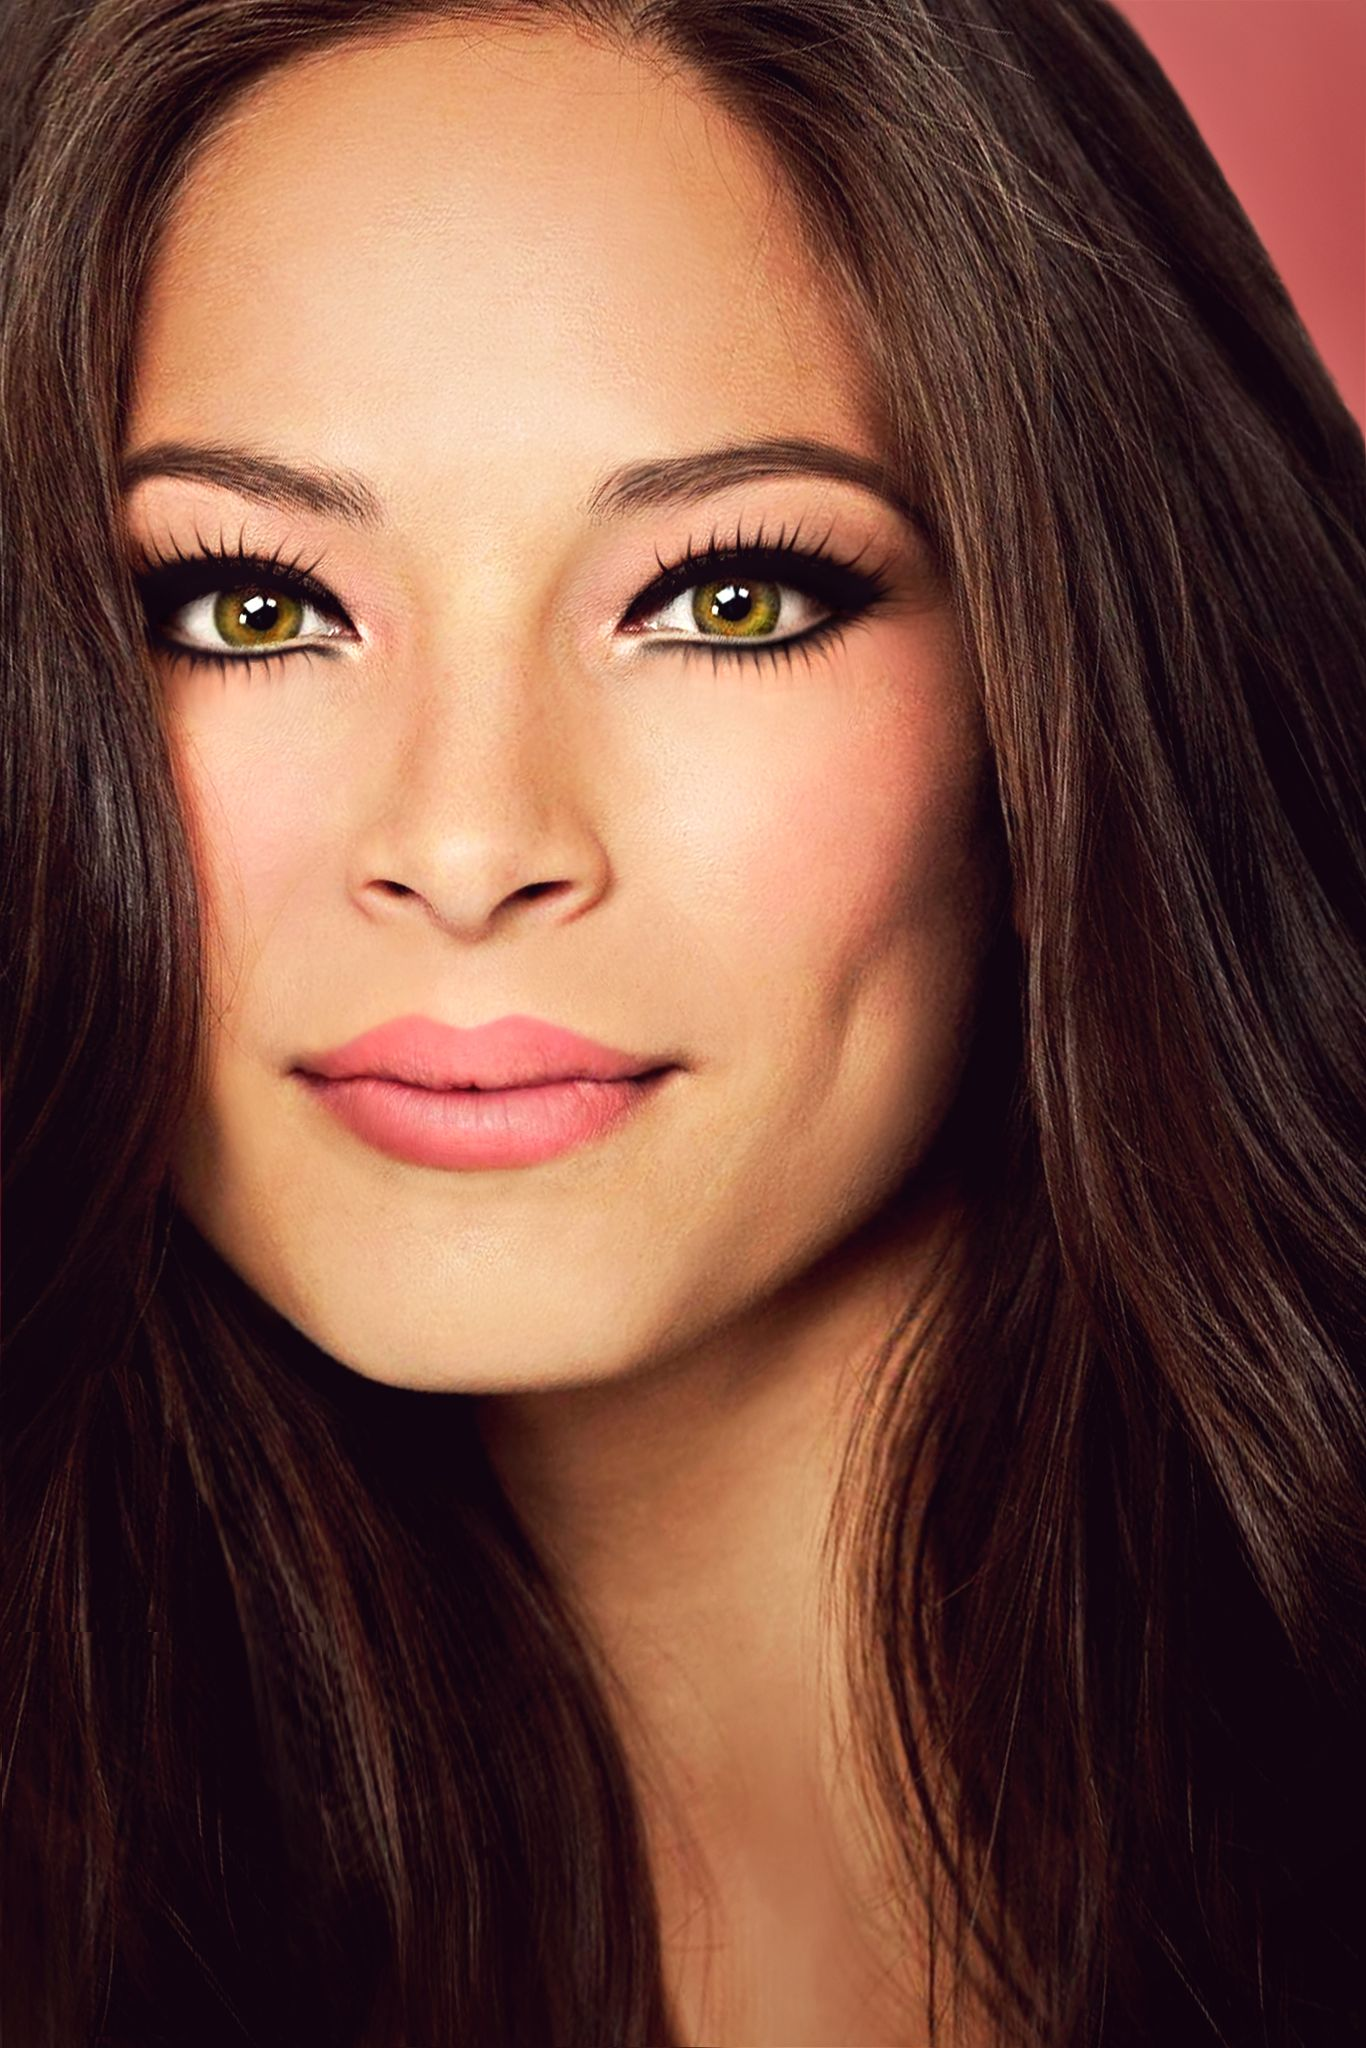 Female Celebrities With Light Brown Hair inside kristin kreuk   makeup & nails   pinterest   kristin kreuk, face